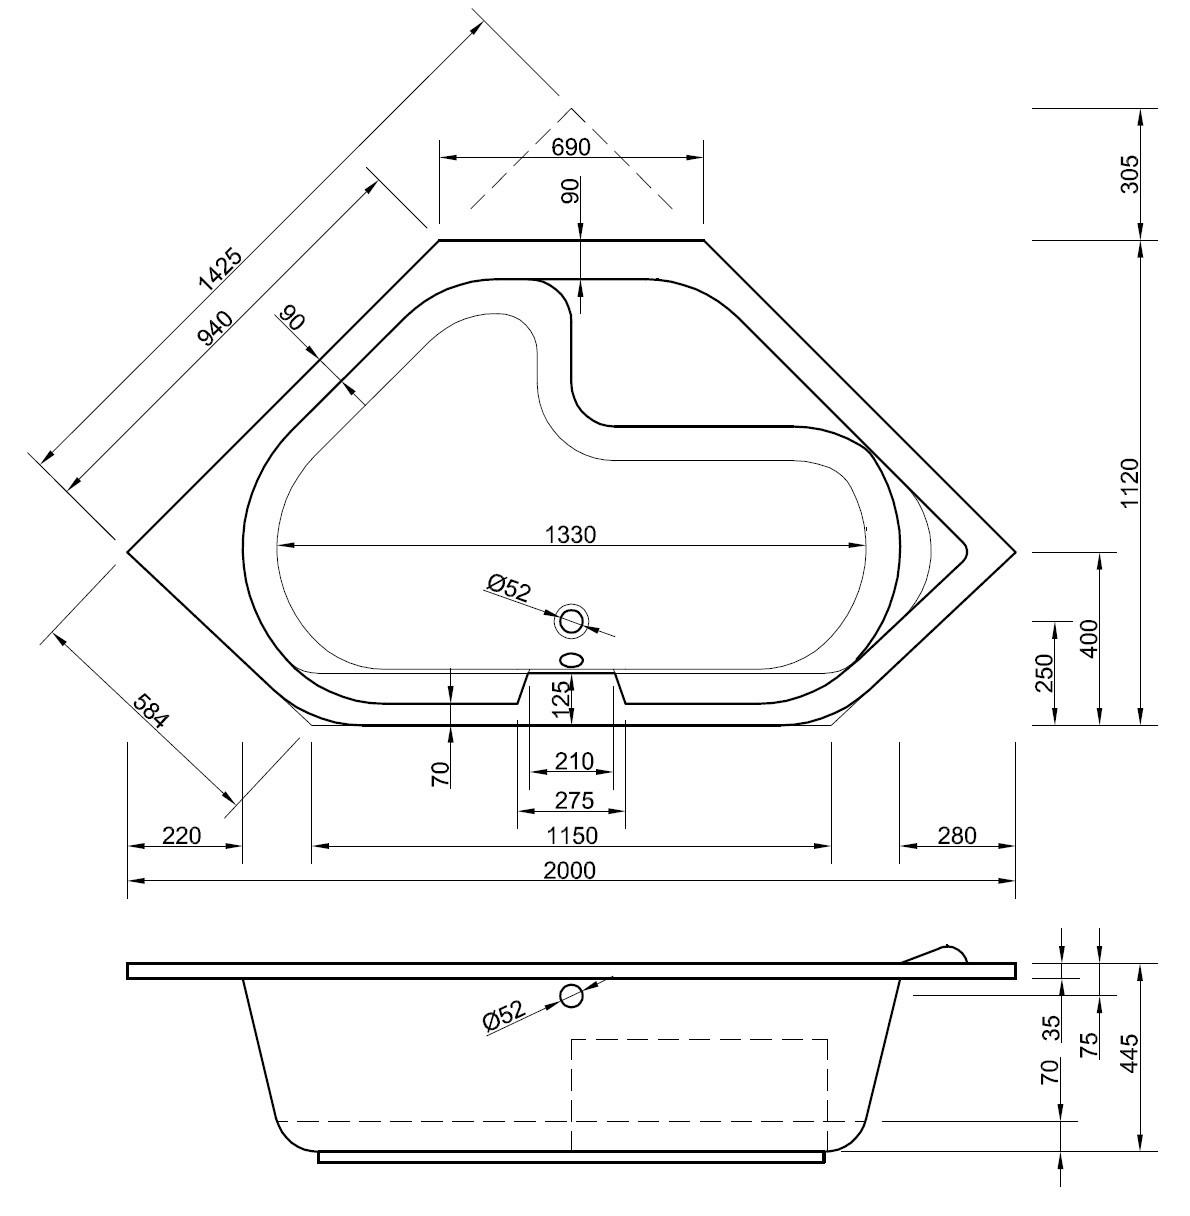 Badewanne maße standard  Badewanne Maße Din: Freistehende badewanne pure 181 cm x 81 cm ...